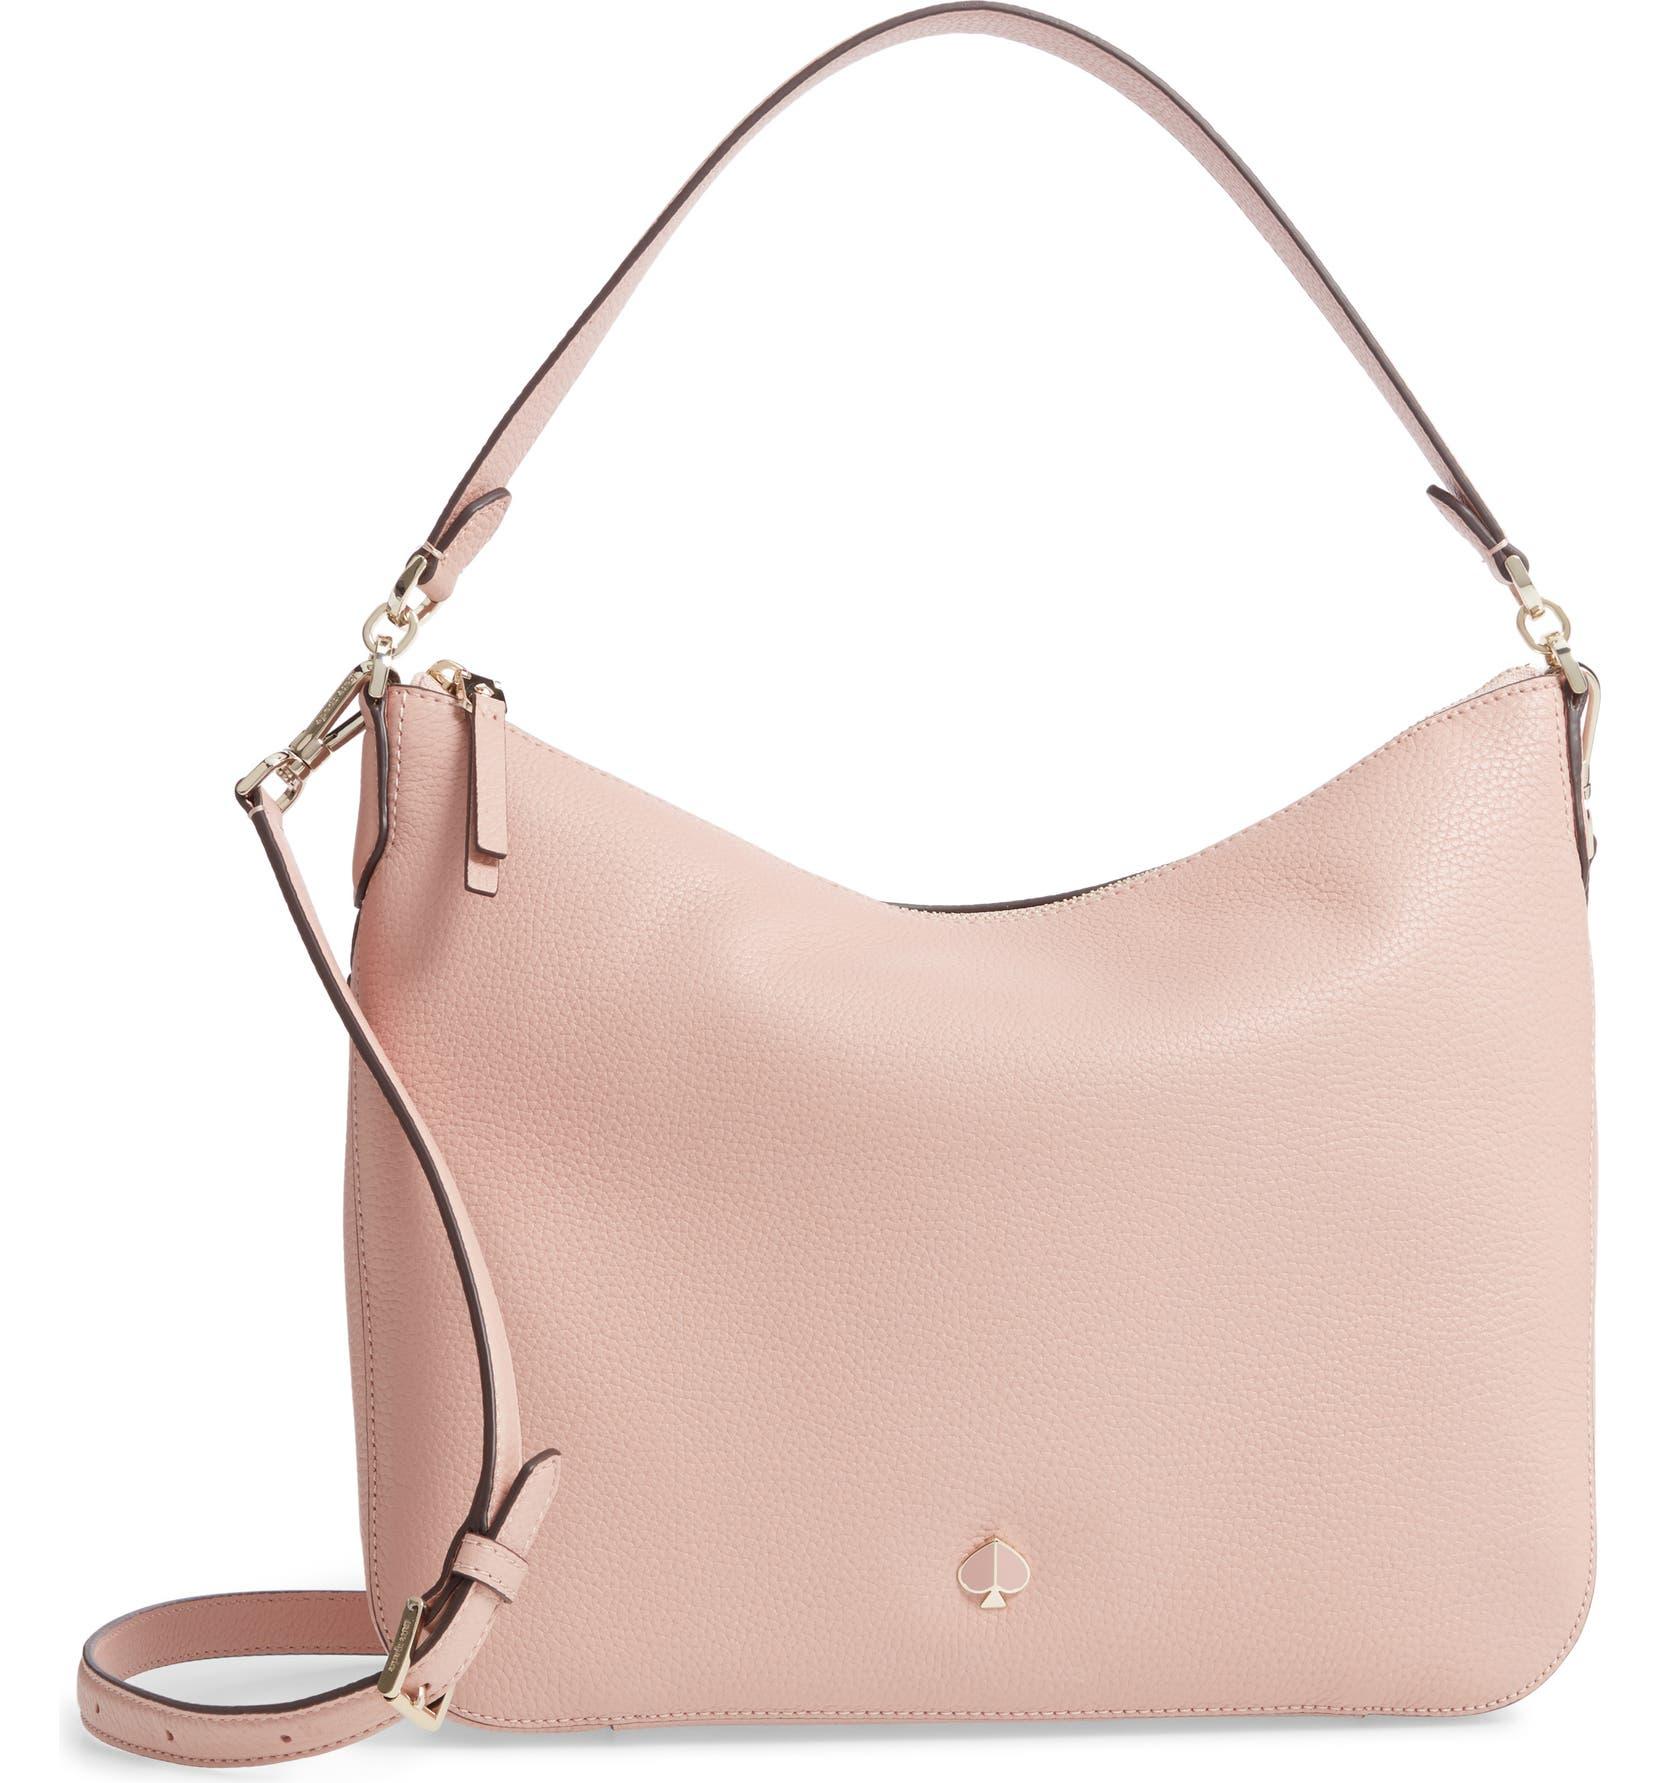 781cc4dfdc85 kate spade new york medium polly leather shoulder bag